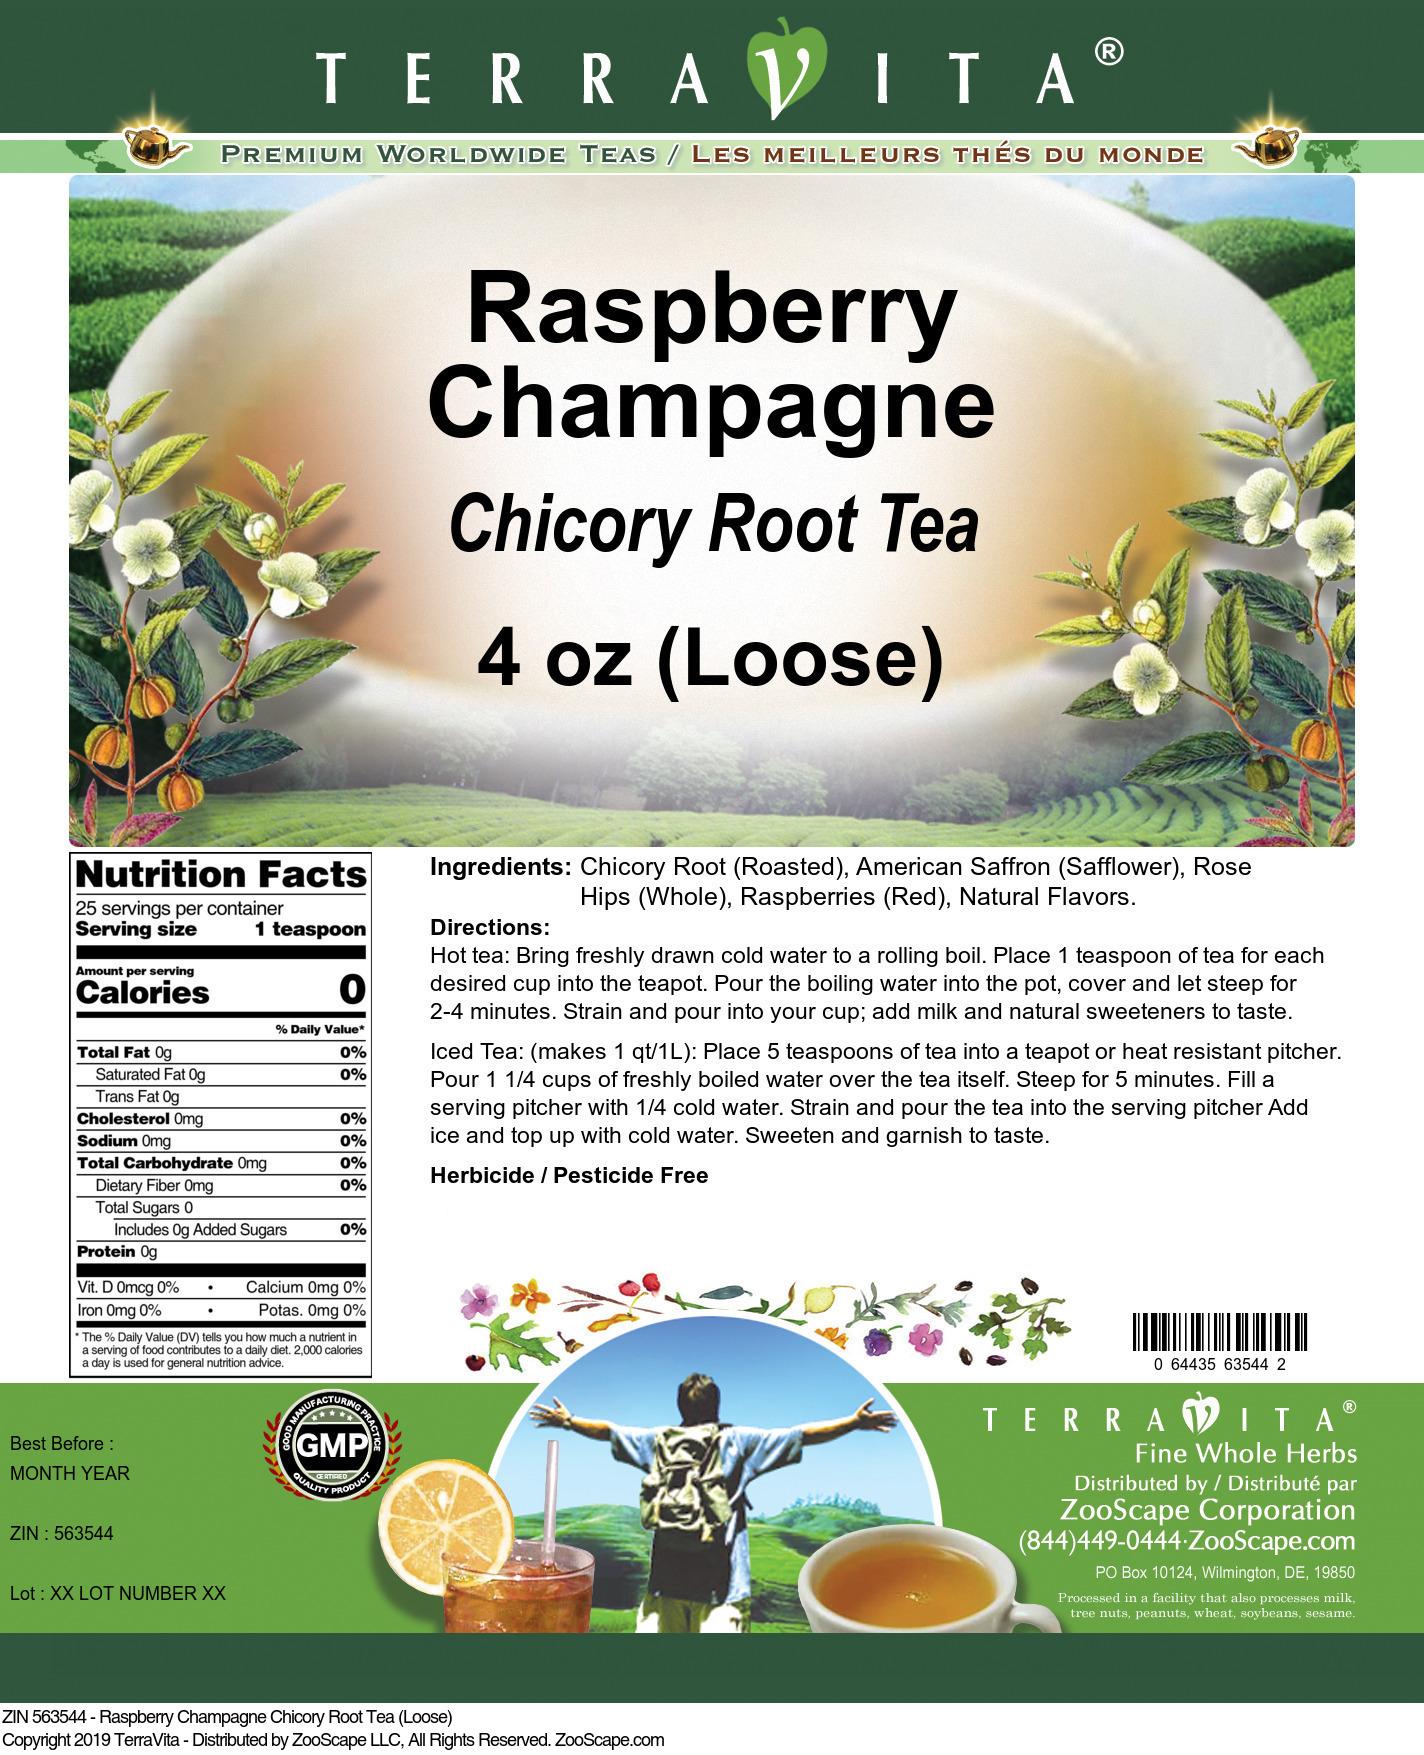 Raspberry Champagne Chicory Root Tea (Loose)